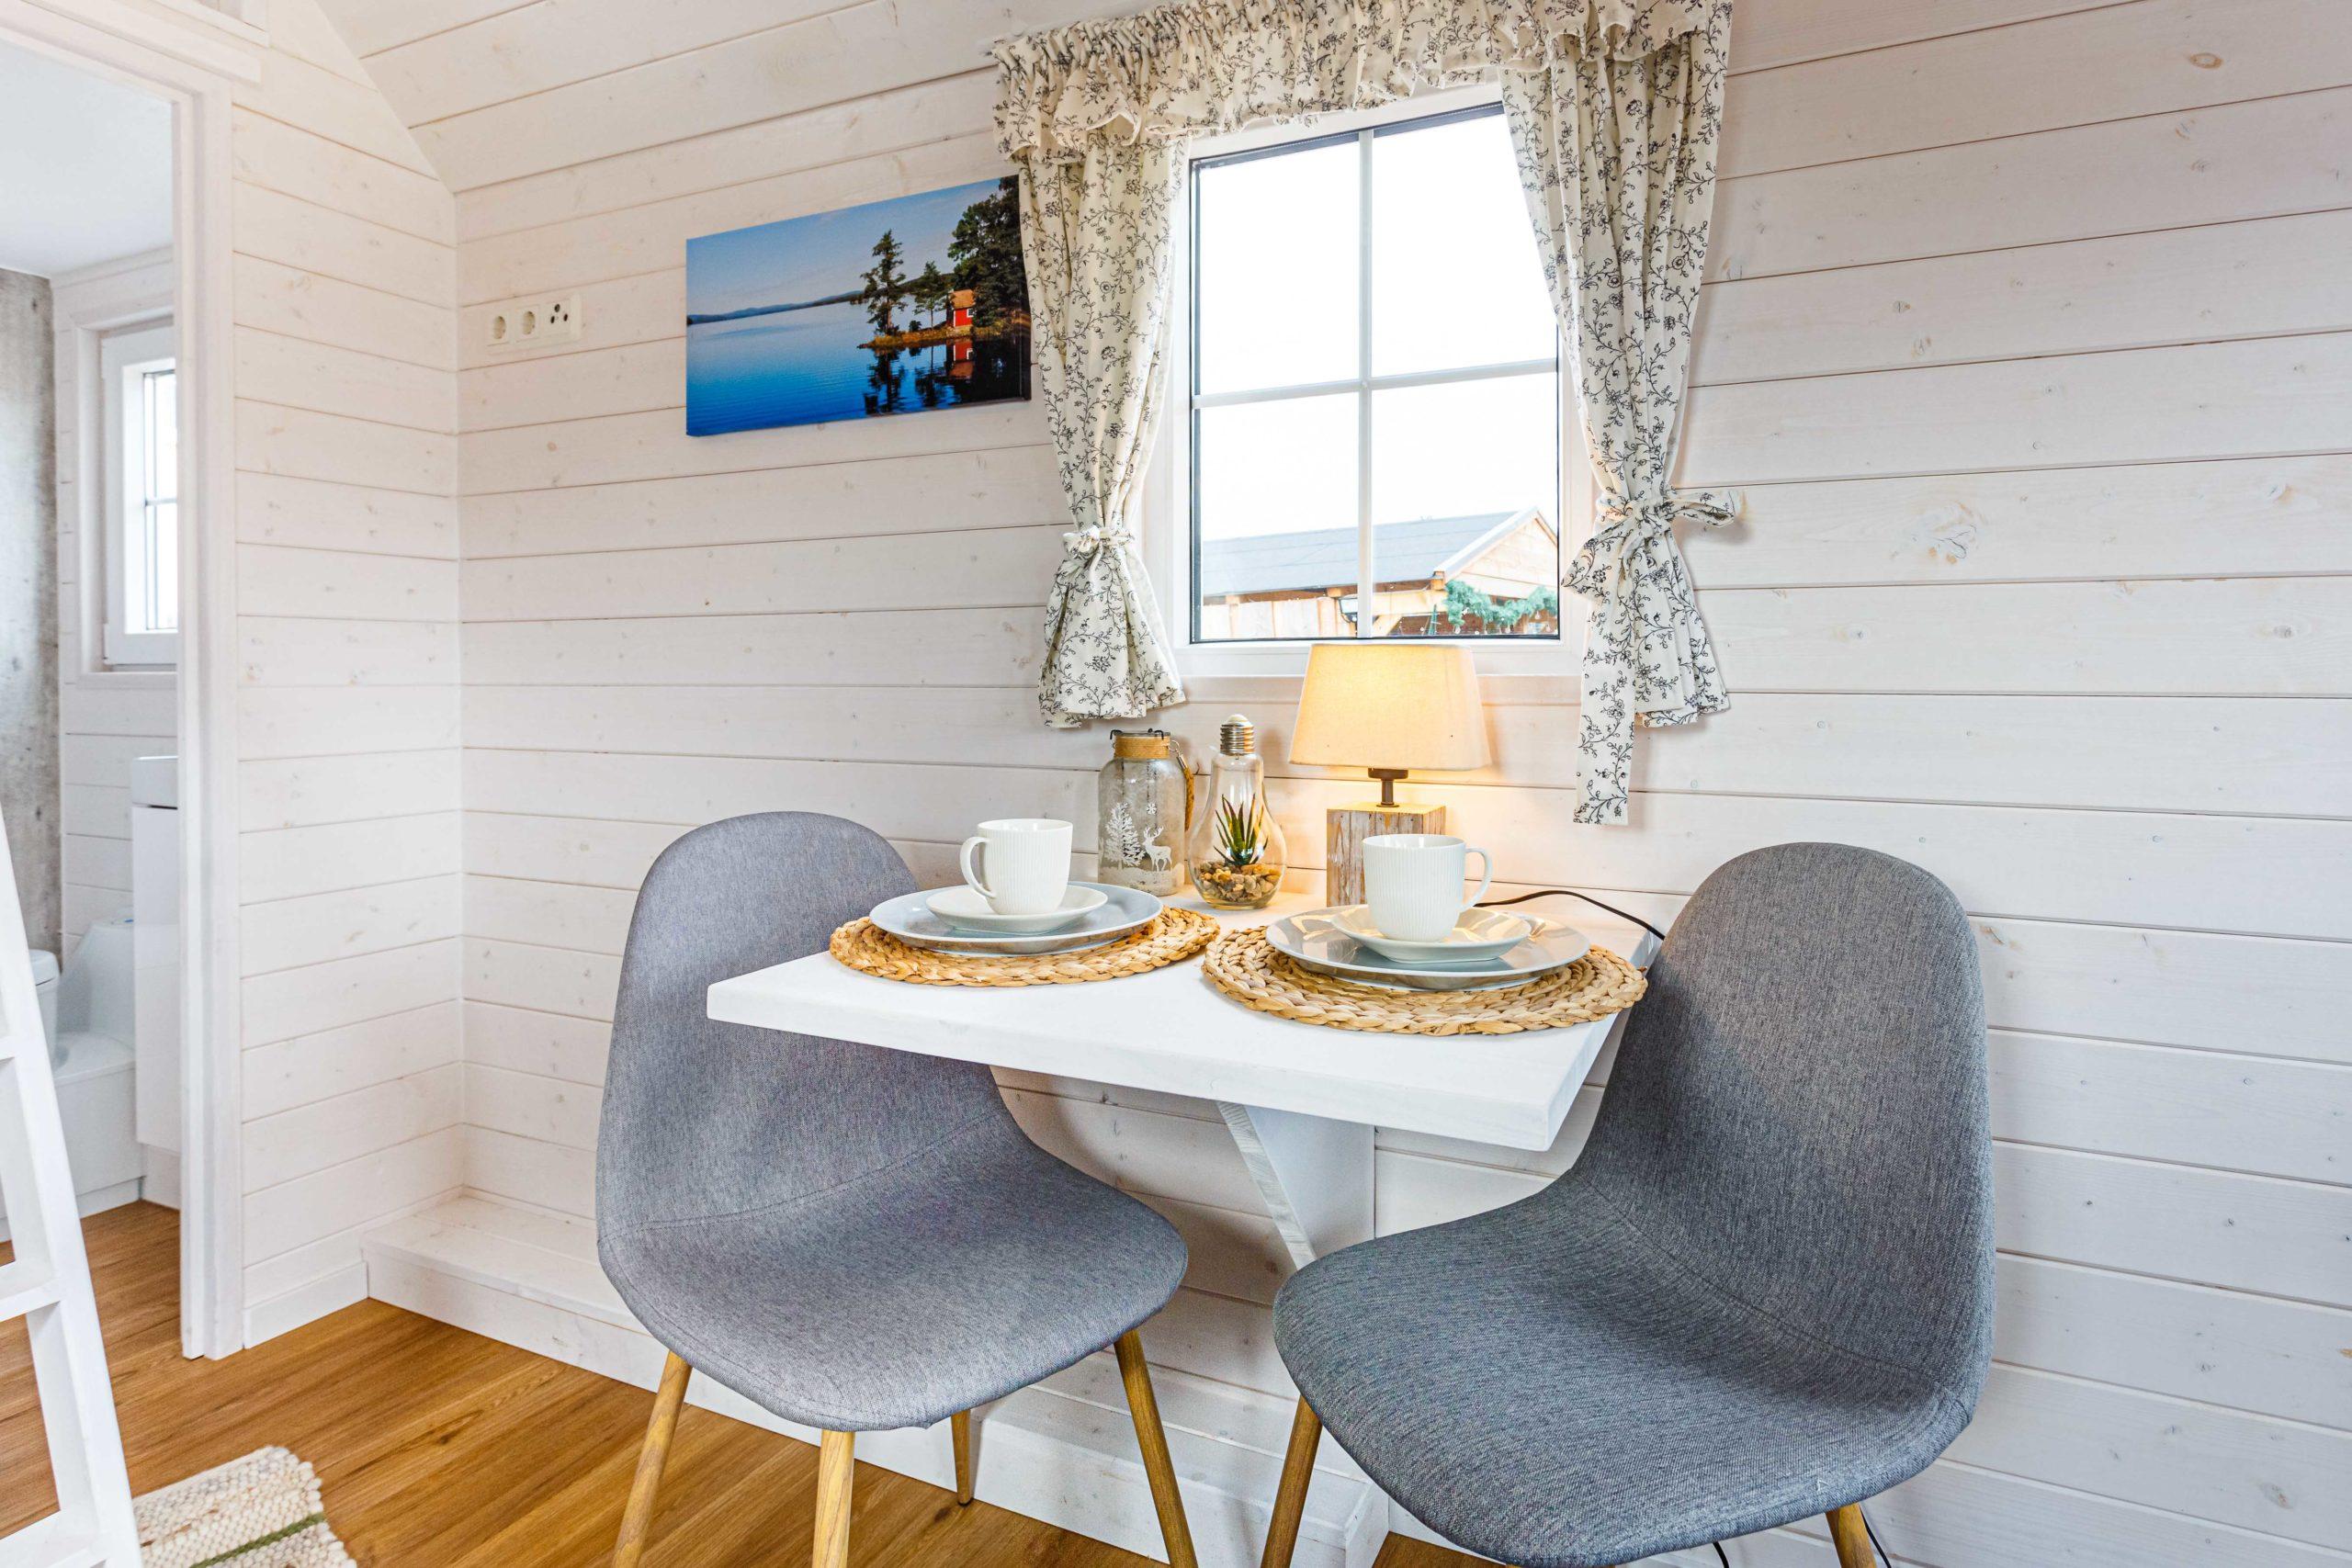 mobiles-tiny-house-schweden-vital-camp-gmbh-18